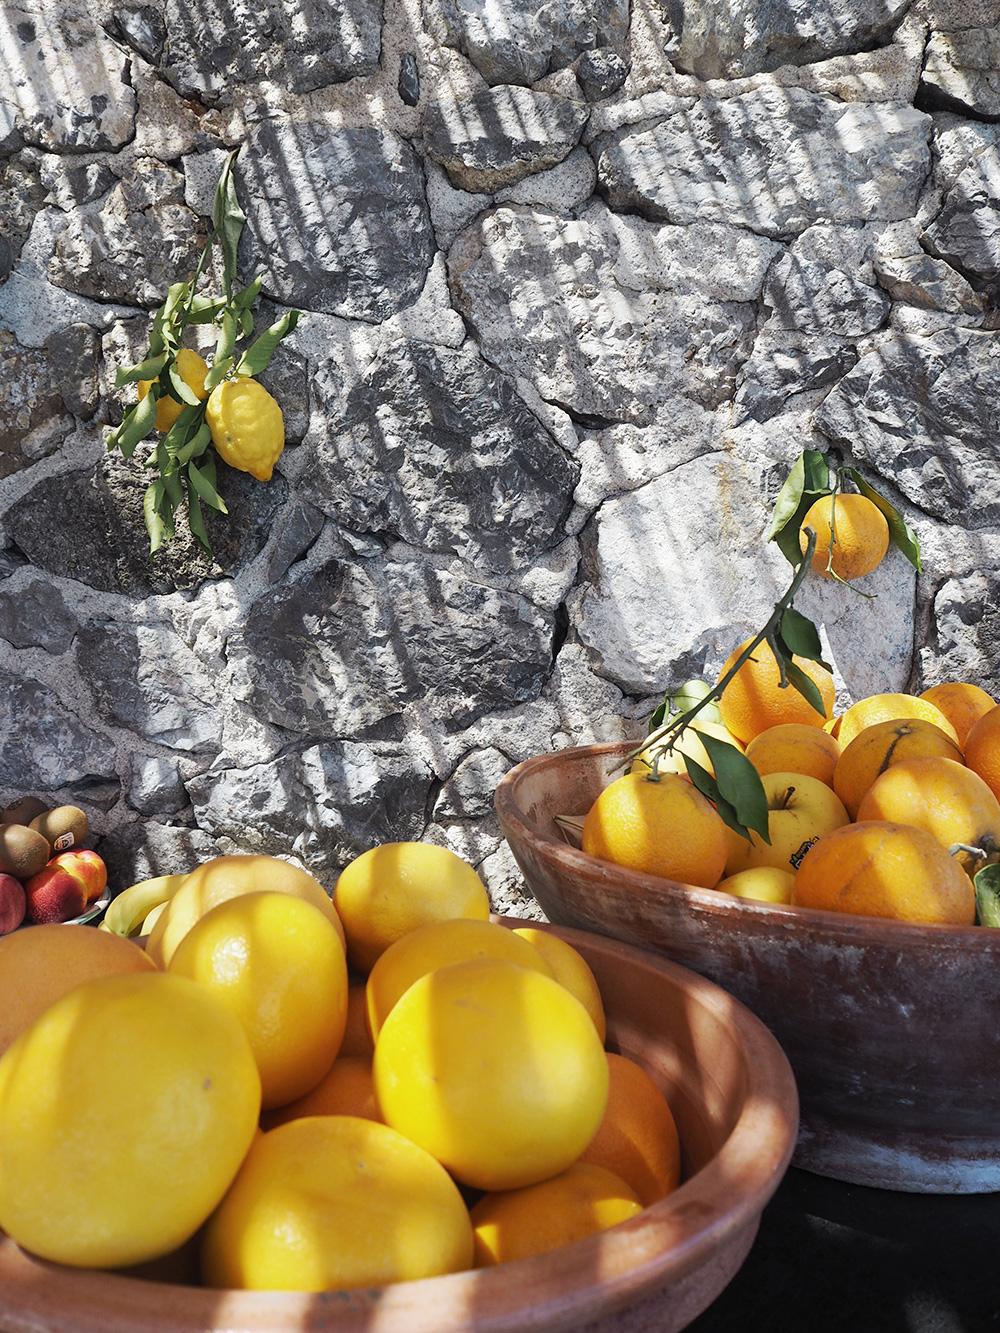 RosyCheeks-Hotel-Santa-Caterina-oranges-lemons